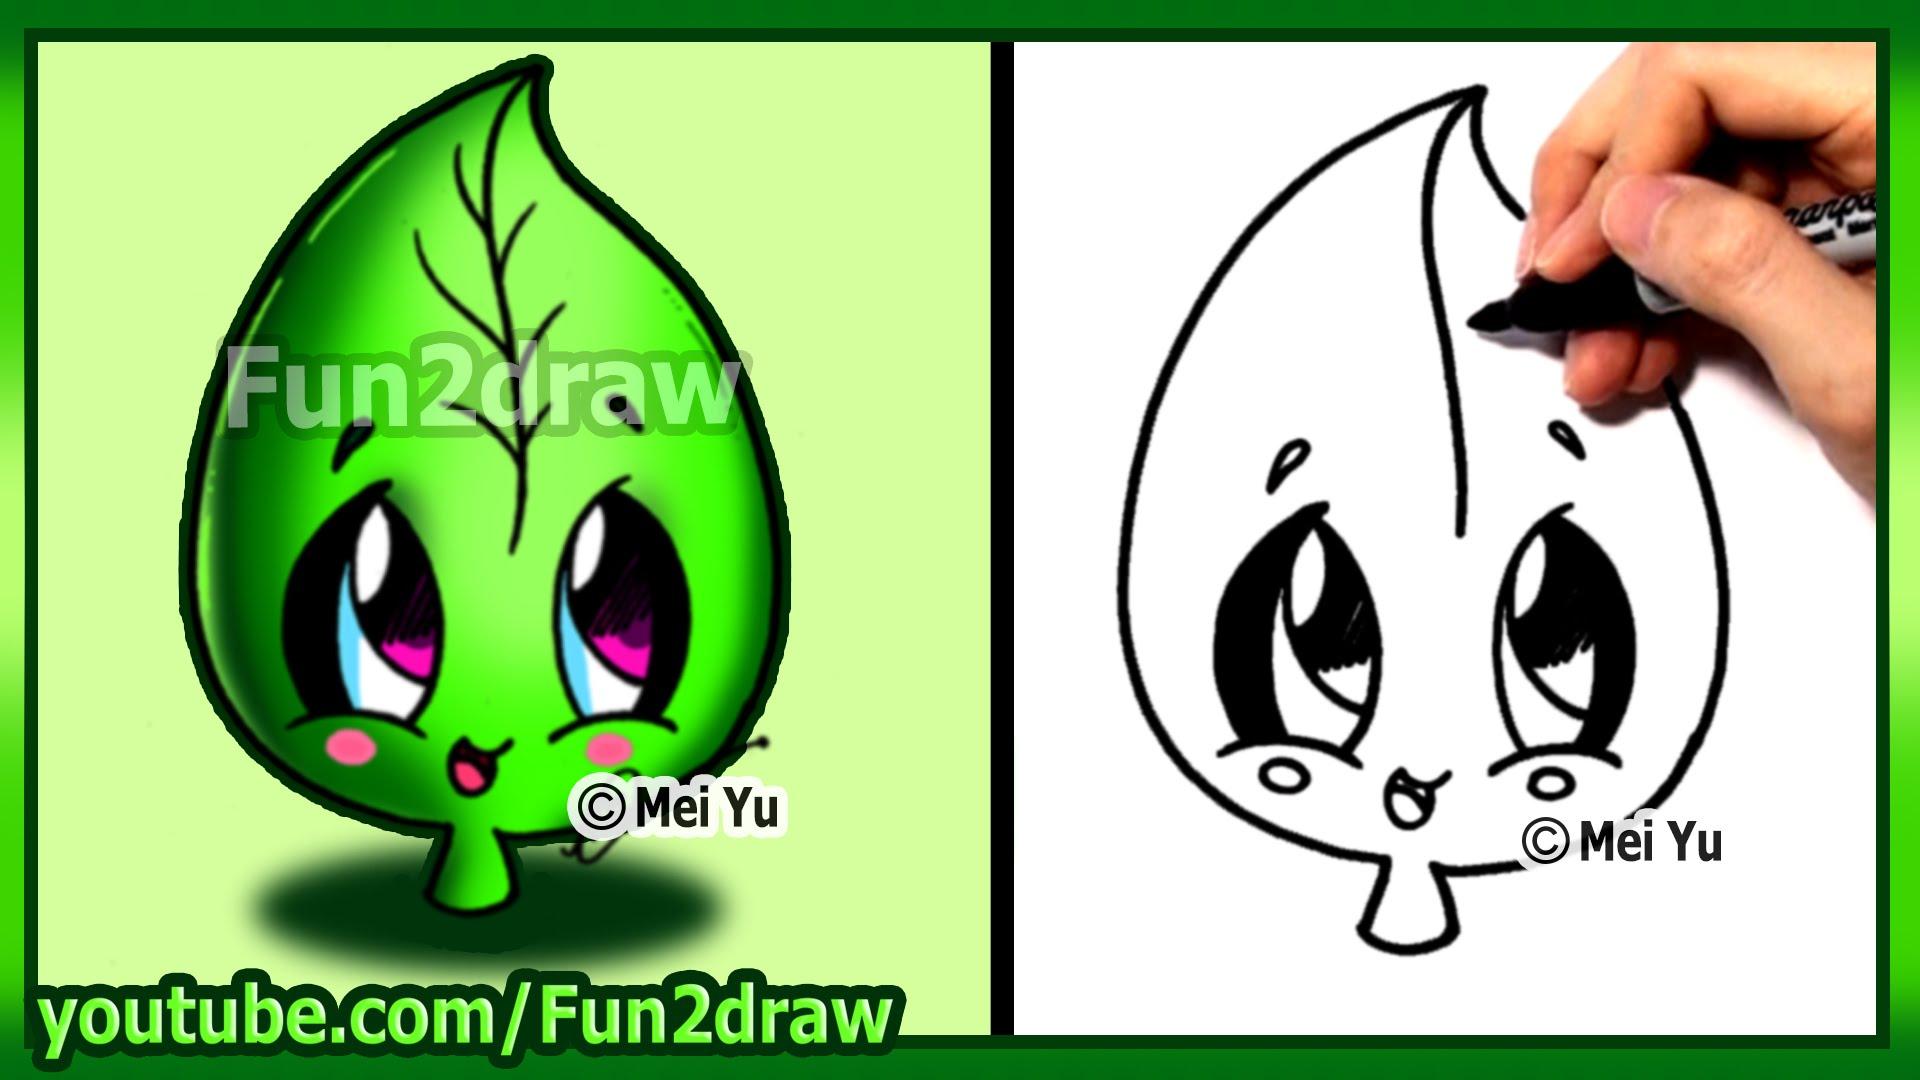 How to Draw Cute Easy - Leaf Earth Day - Fun2draw - YouTube